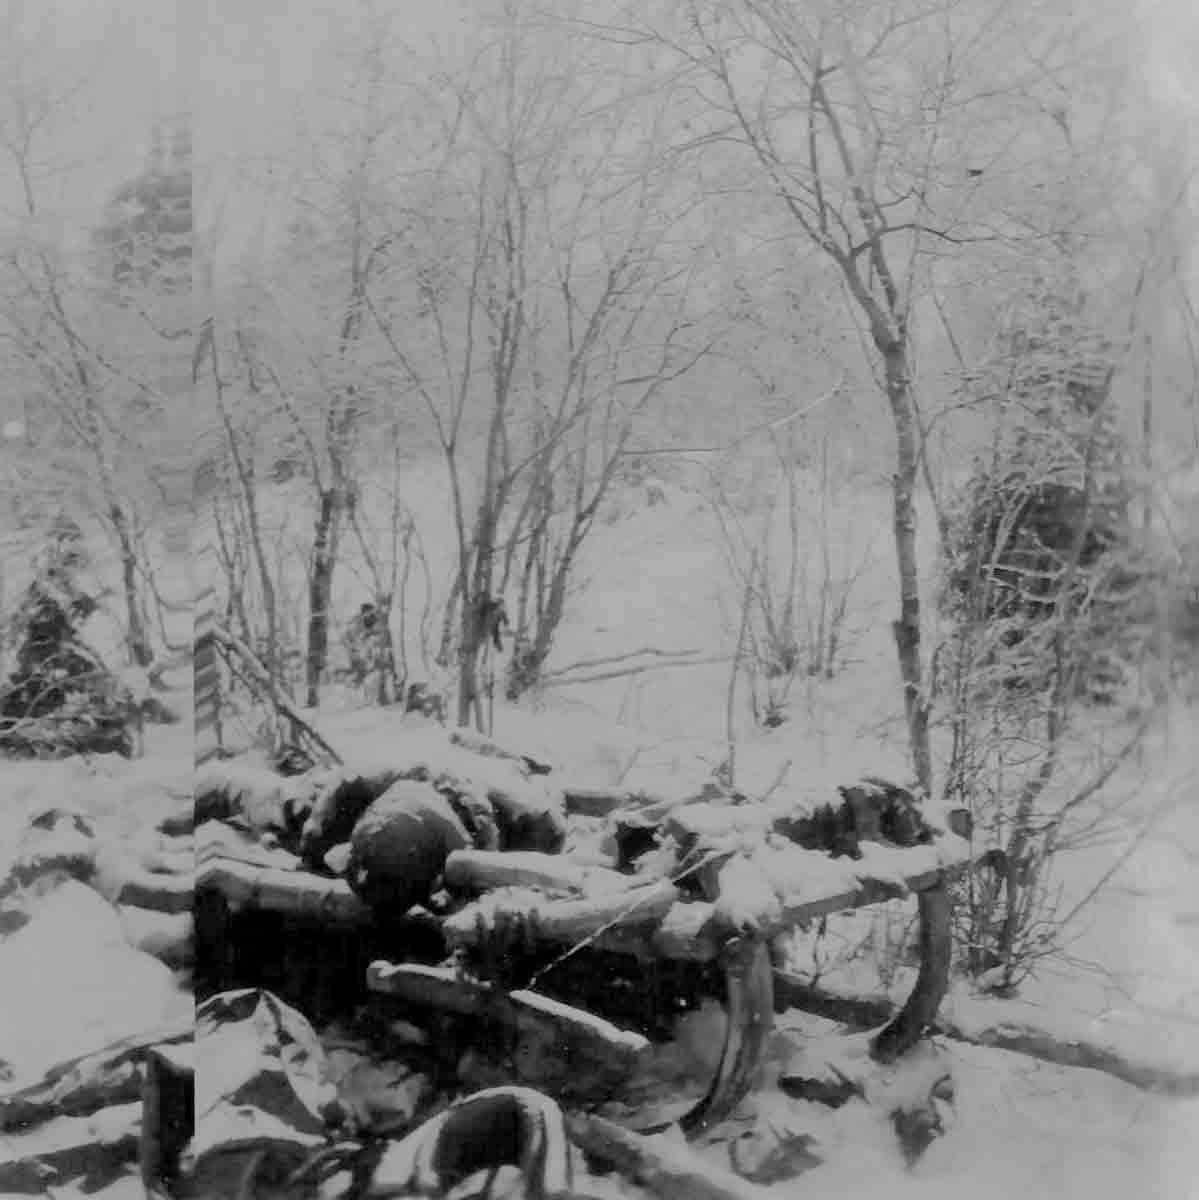 Donsbach Winter 1943 Kesselschlacht